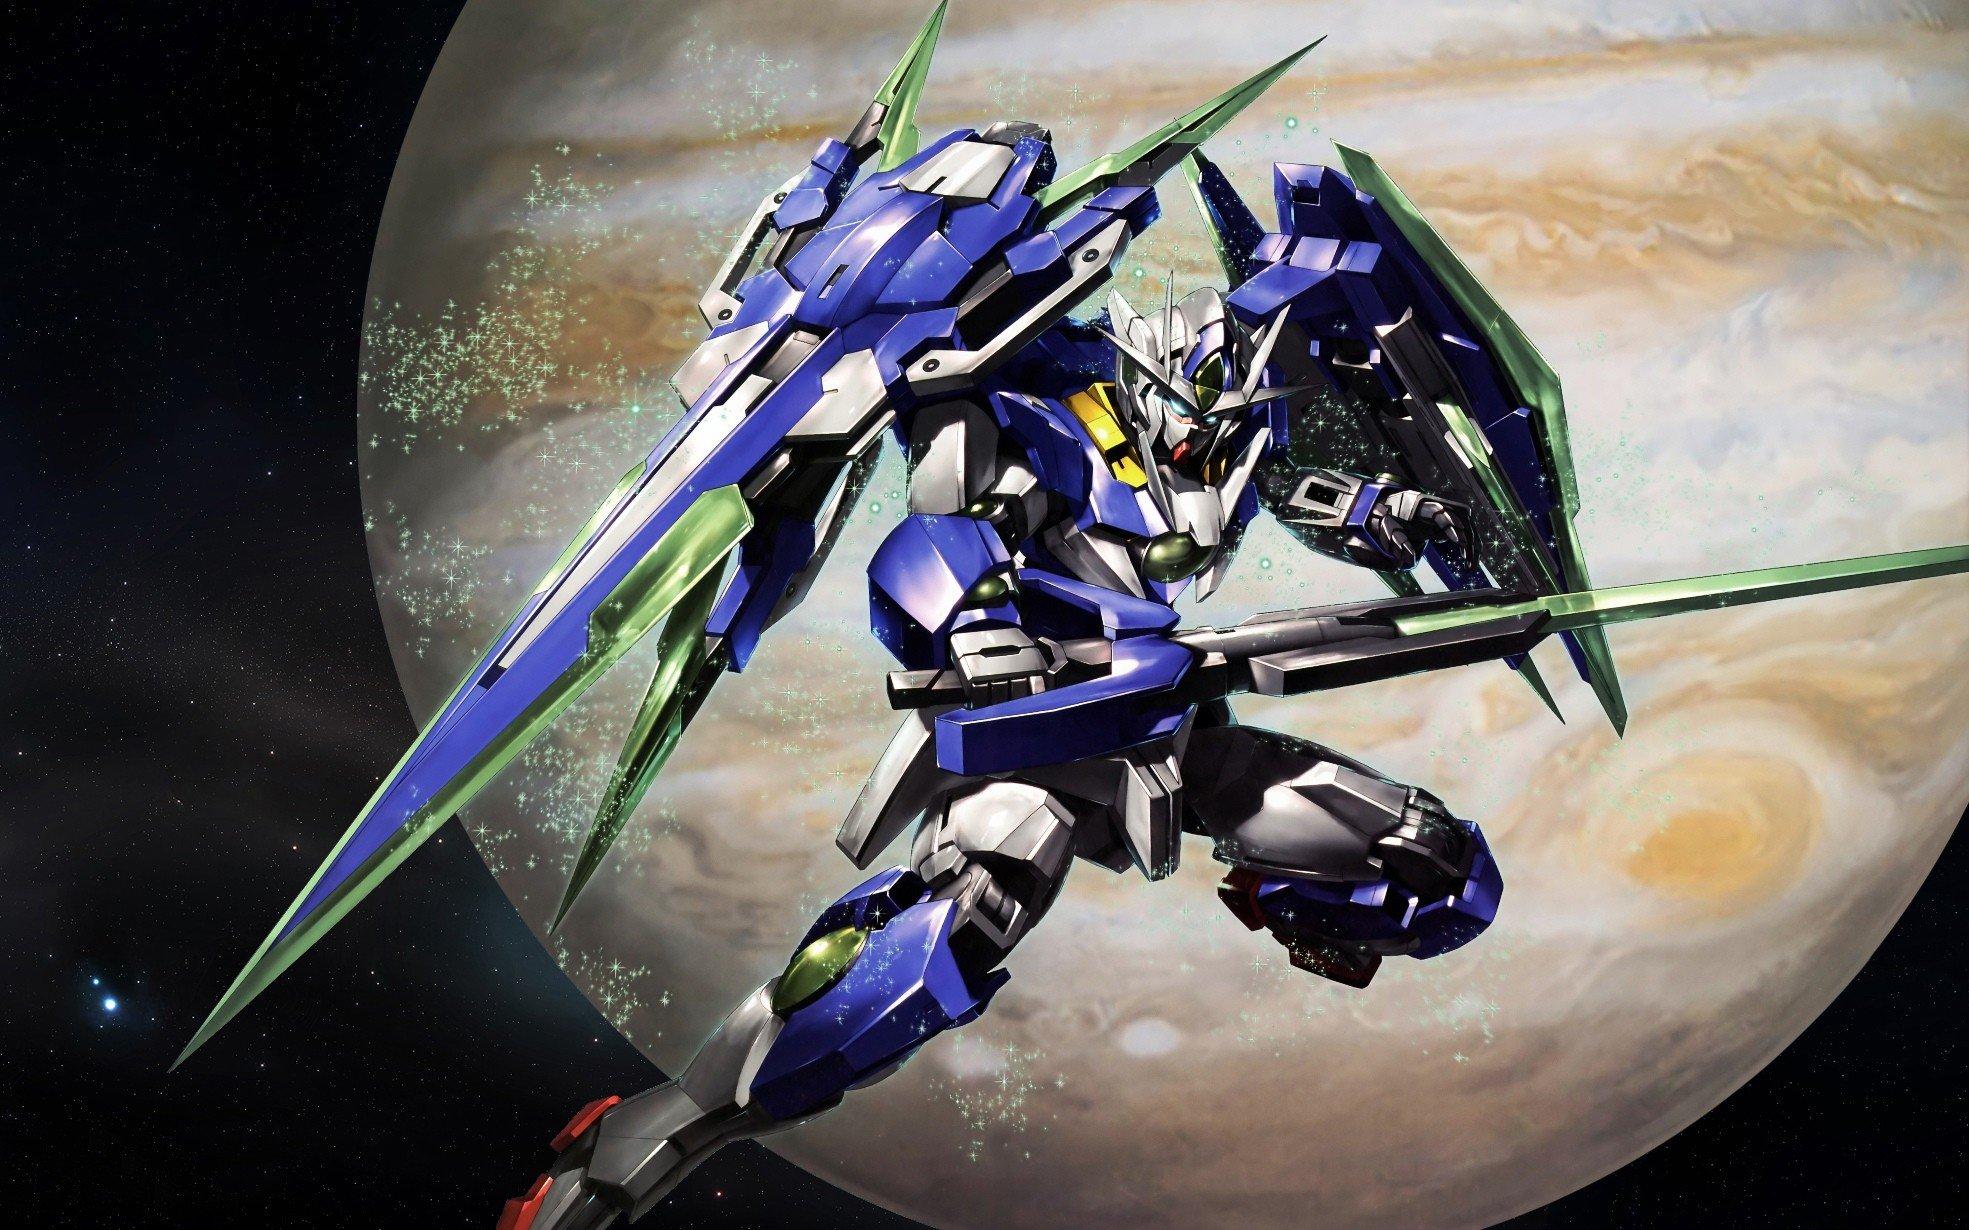 73 Gundam 00 Wallpaper Hd On Wallpapersafari